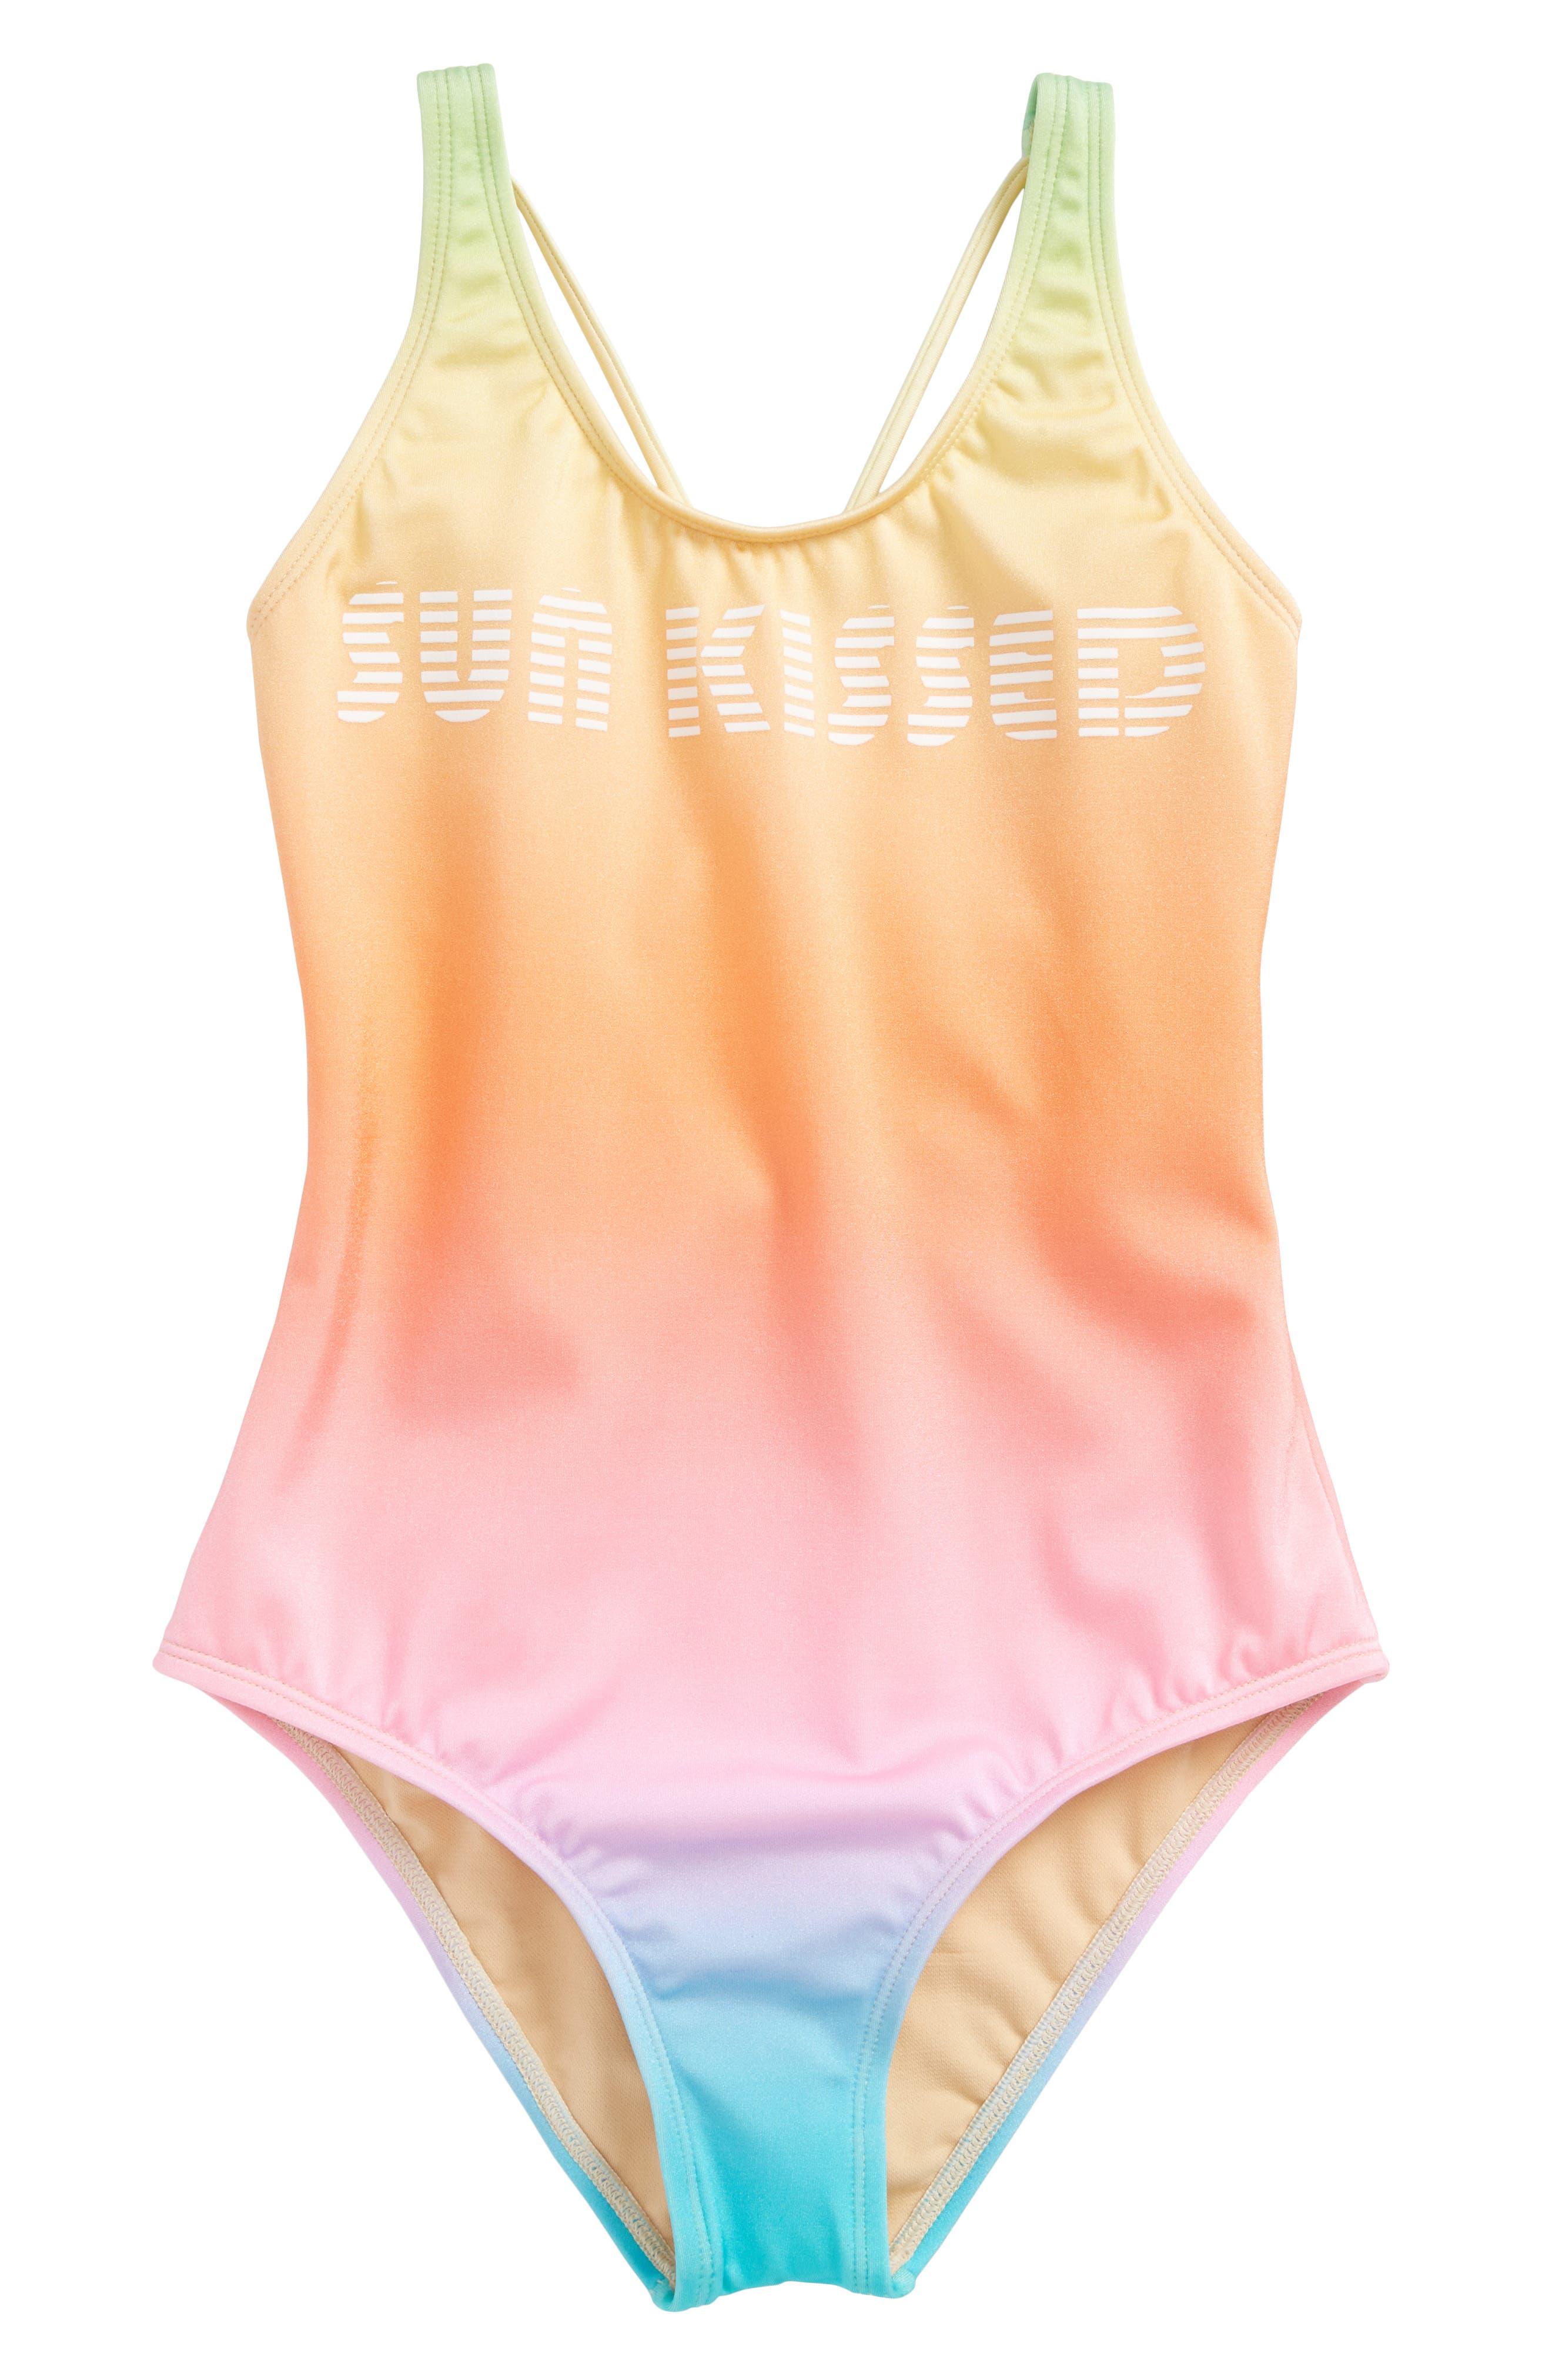 Teen Spirit Sun Kissed One-Piece Swimsuit,                             Main thumbnail 1, color,                             441